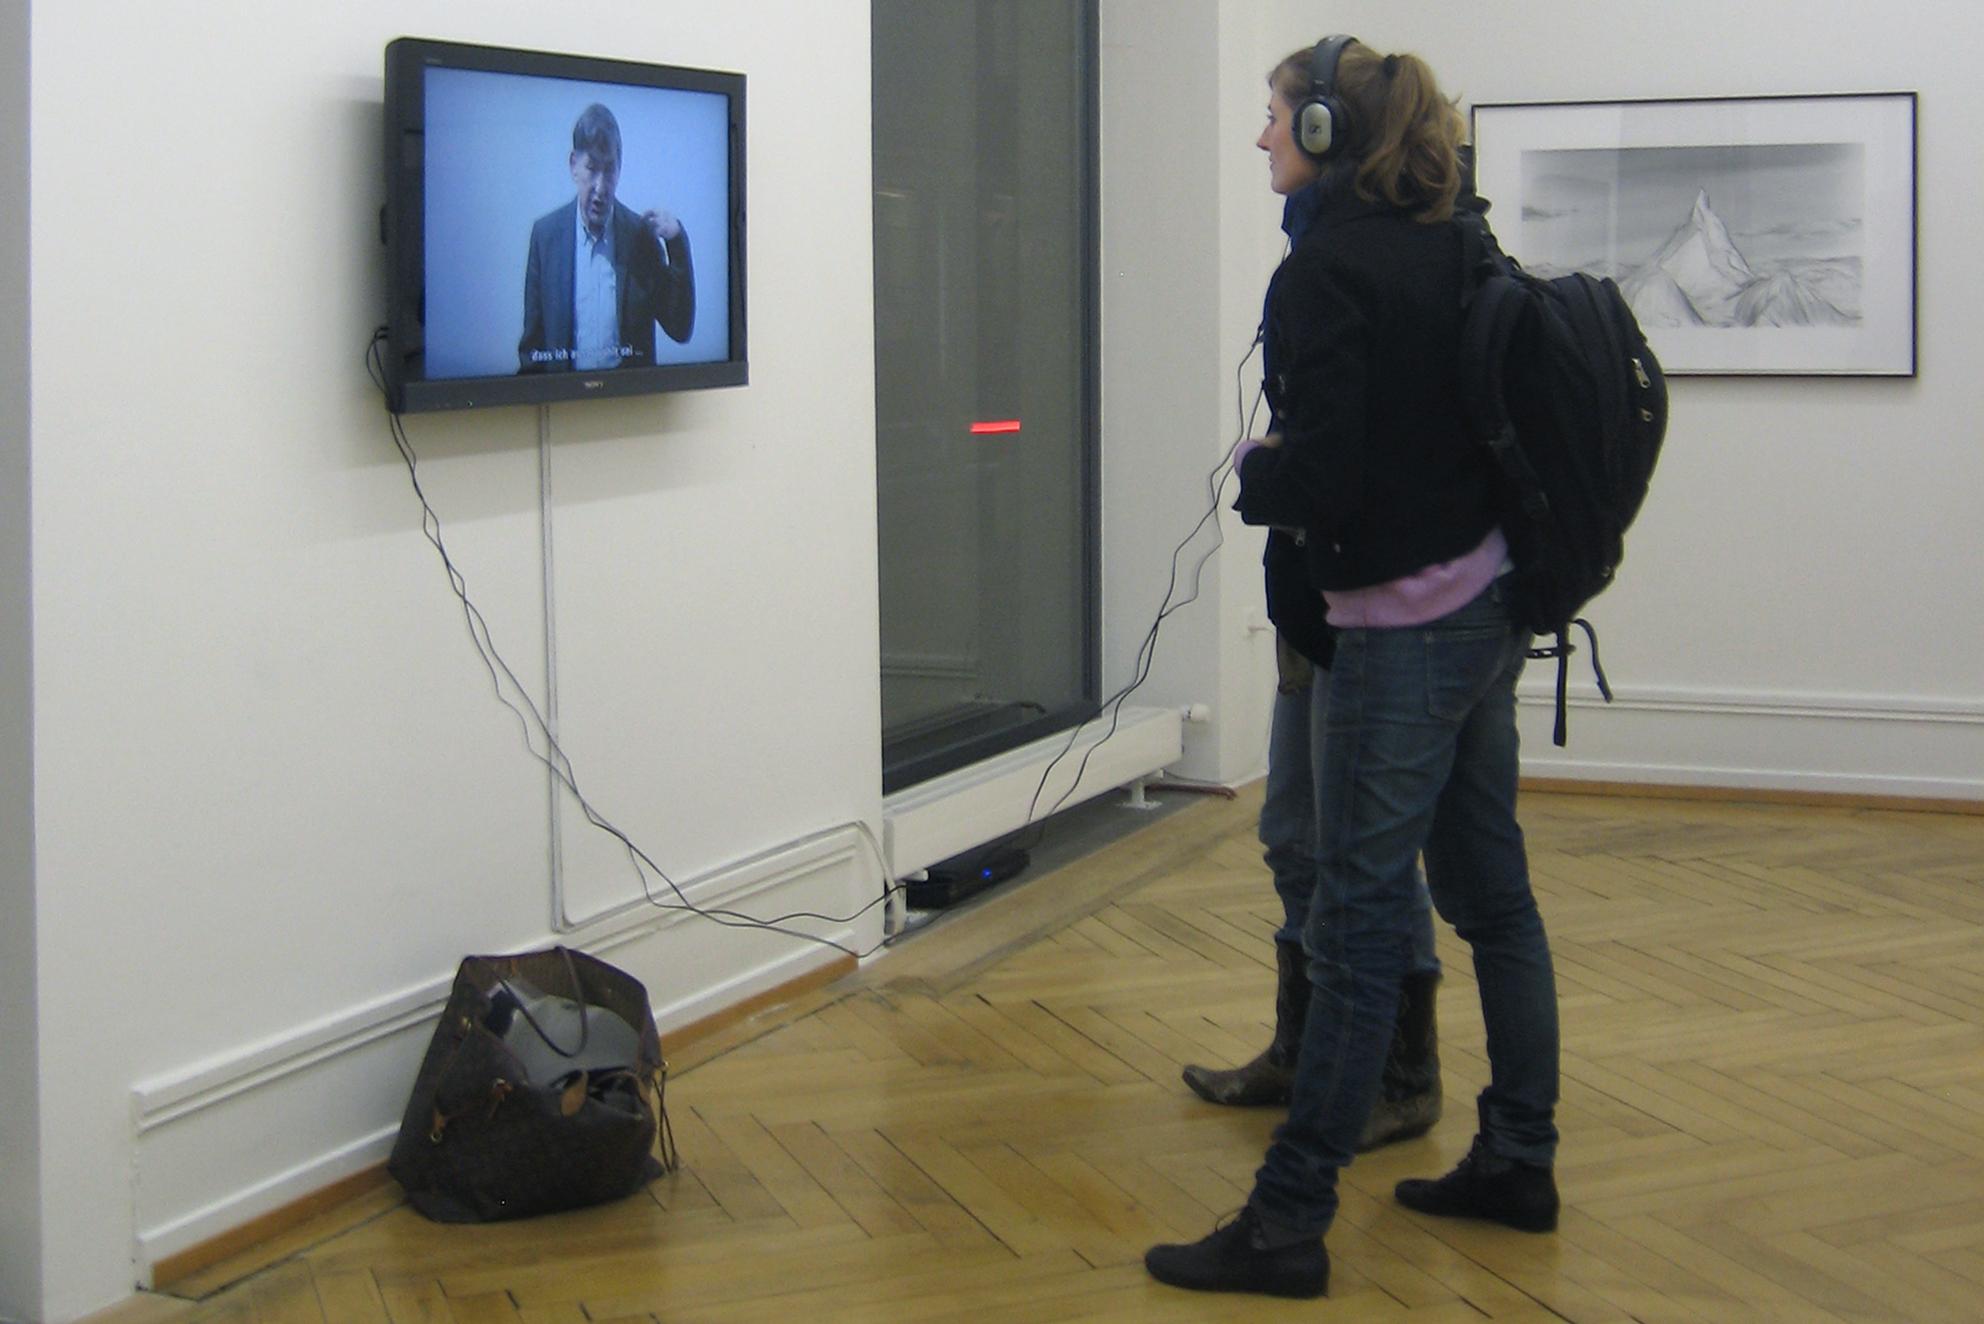 Ways of Worldmaking, video HD, 16/9, 1080p, 15'30'', 2010